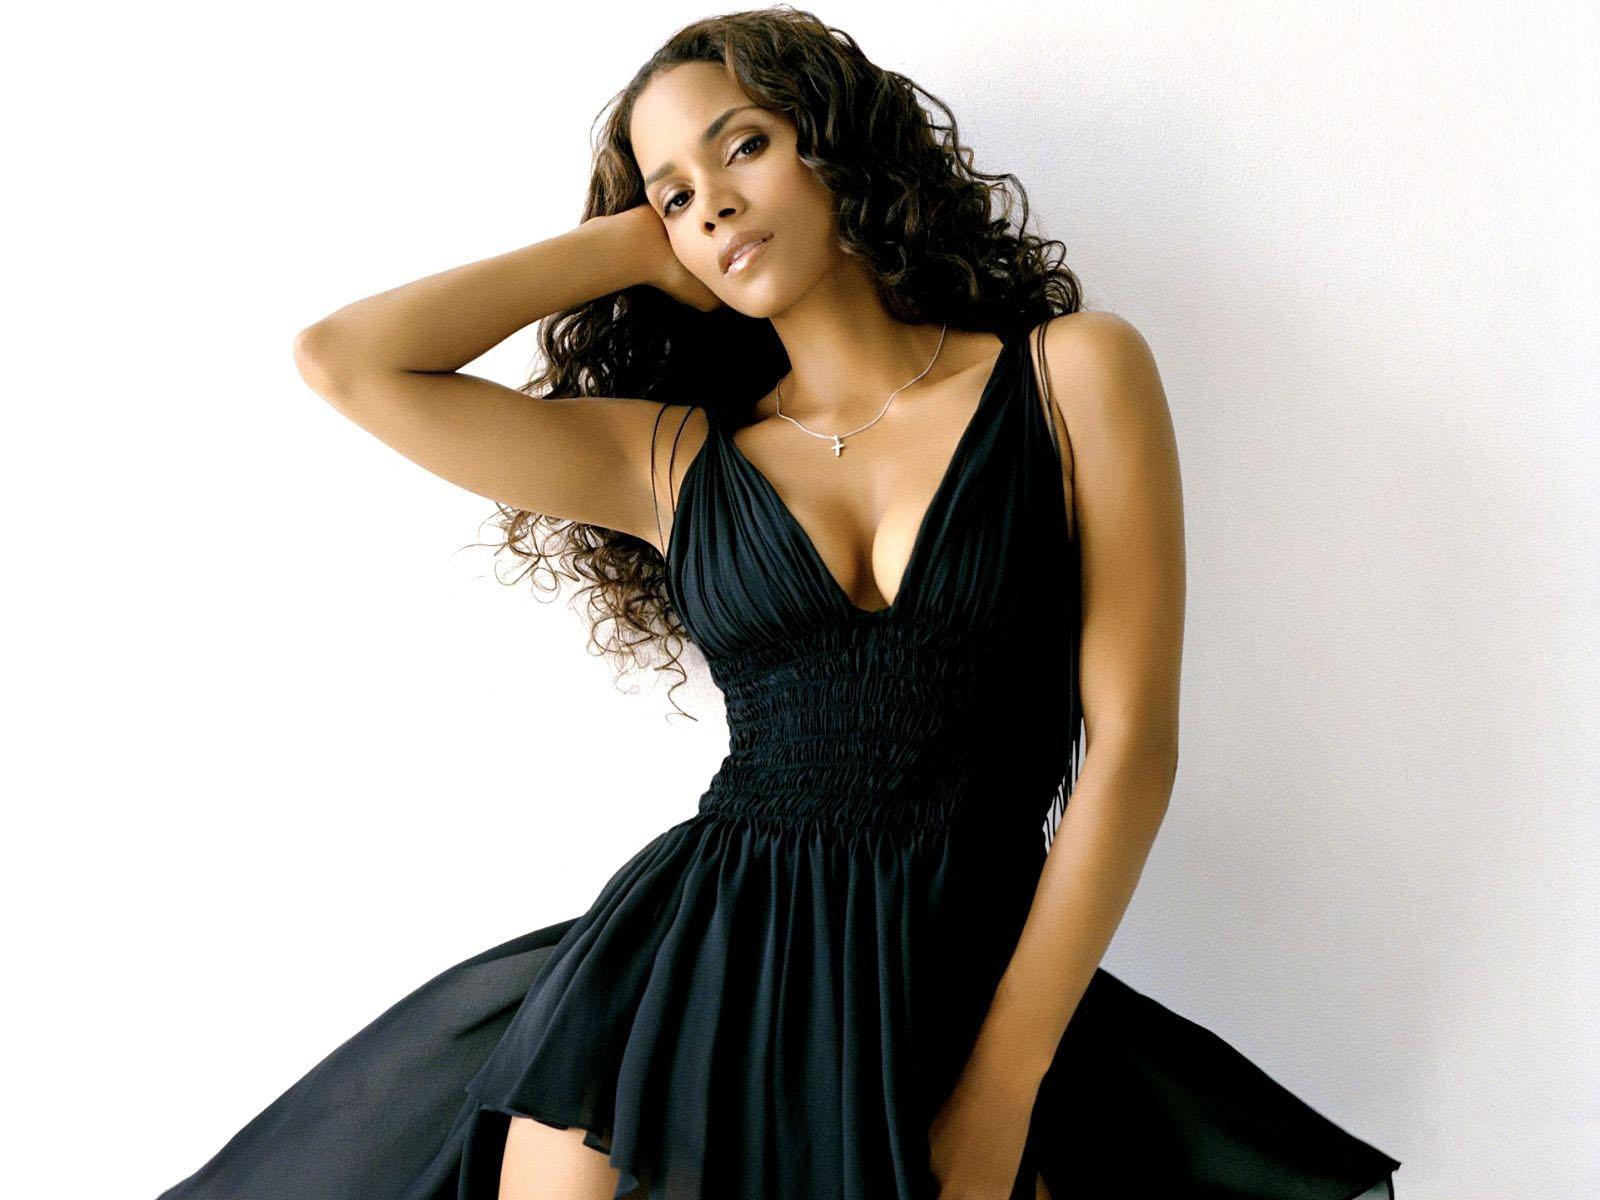 http://2.bp.blogspot.com/-nYUOos0hyKw/Tmdo3R1DdgI/AAAAAAAAFhU/Gu6VakXHCKk/s1600/halle-berry-in-black-dress_1600x1200_58026.jpg